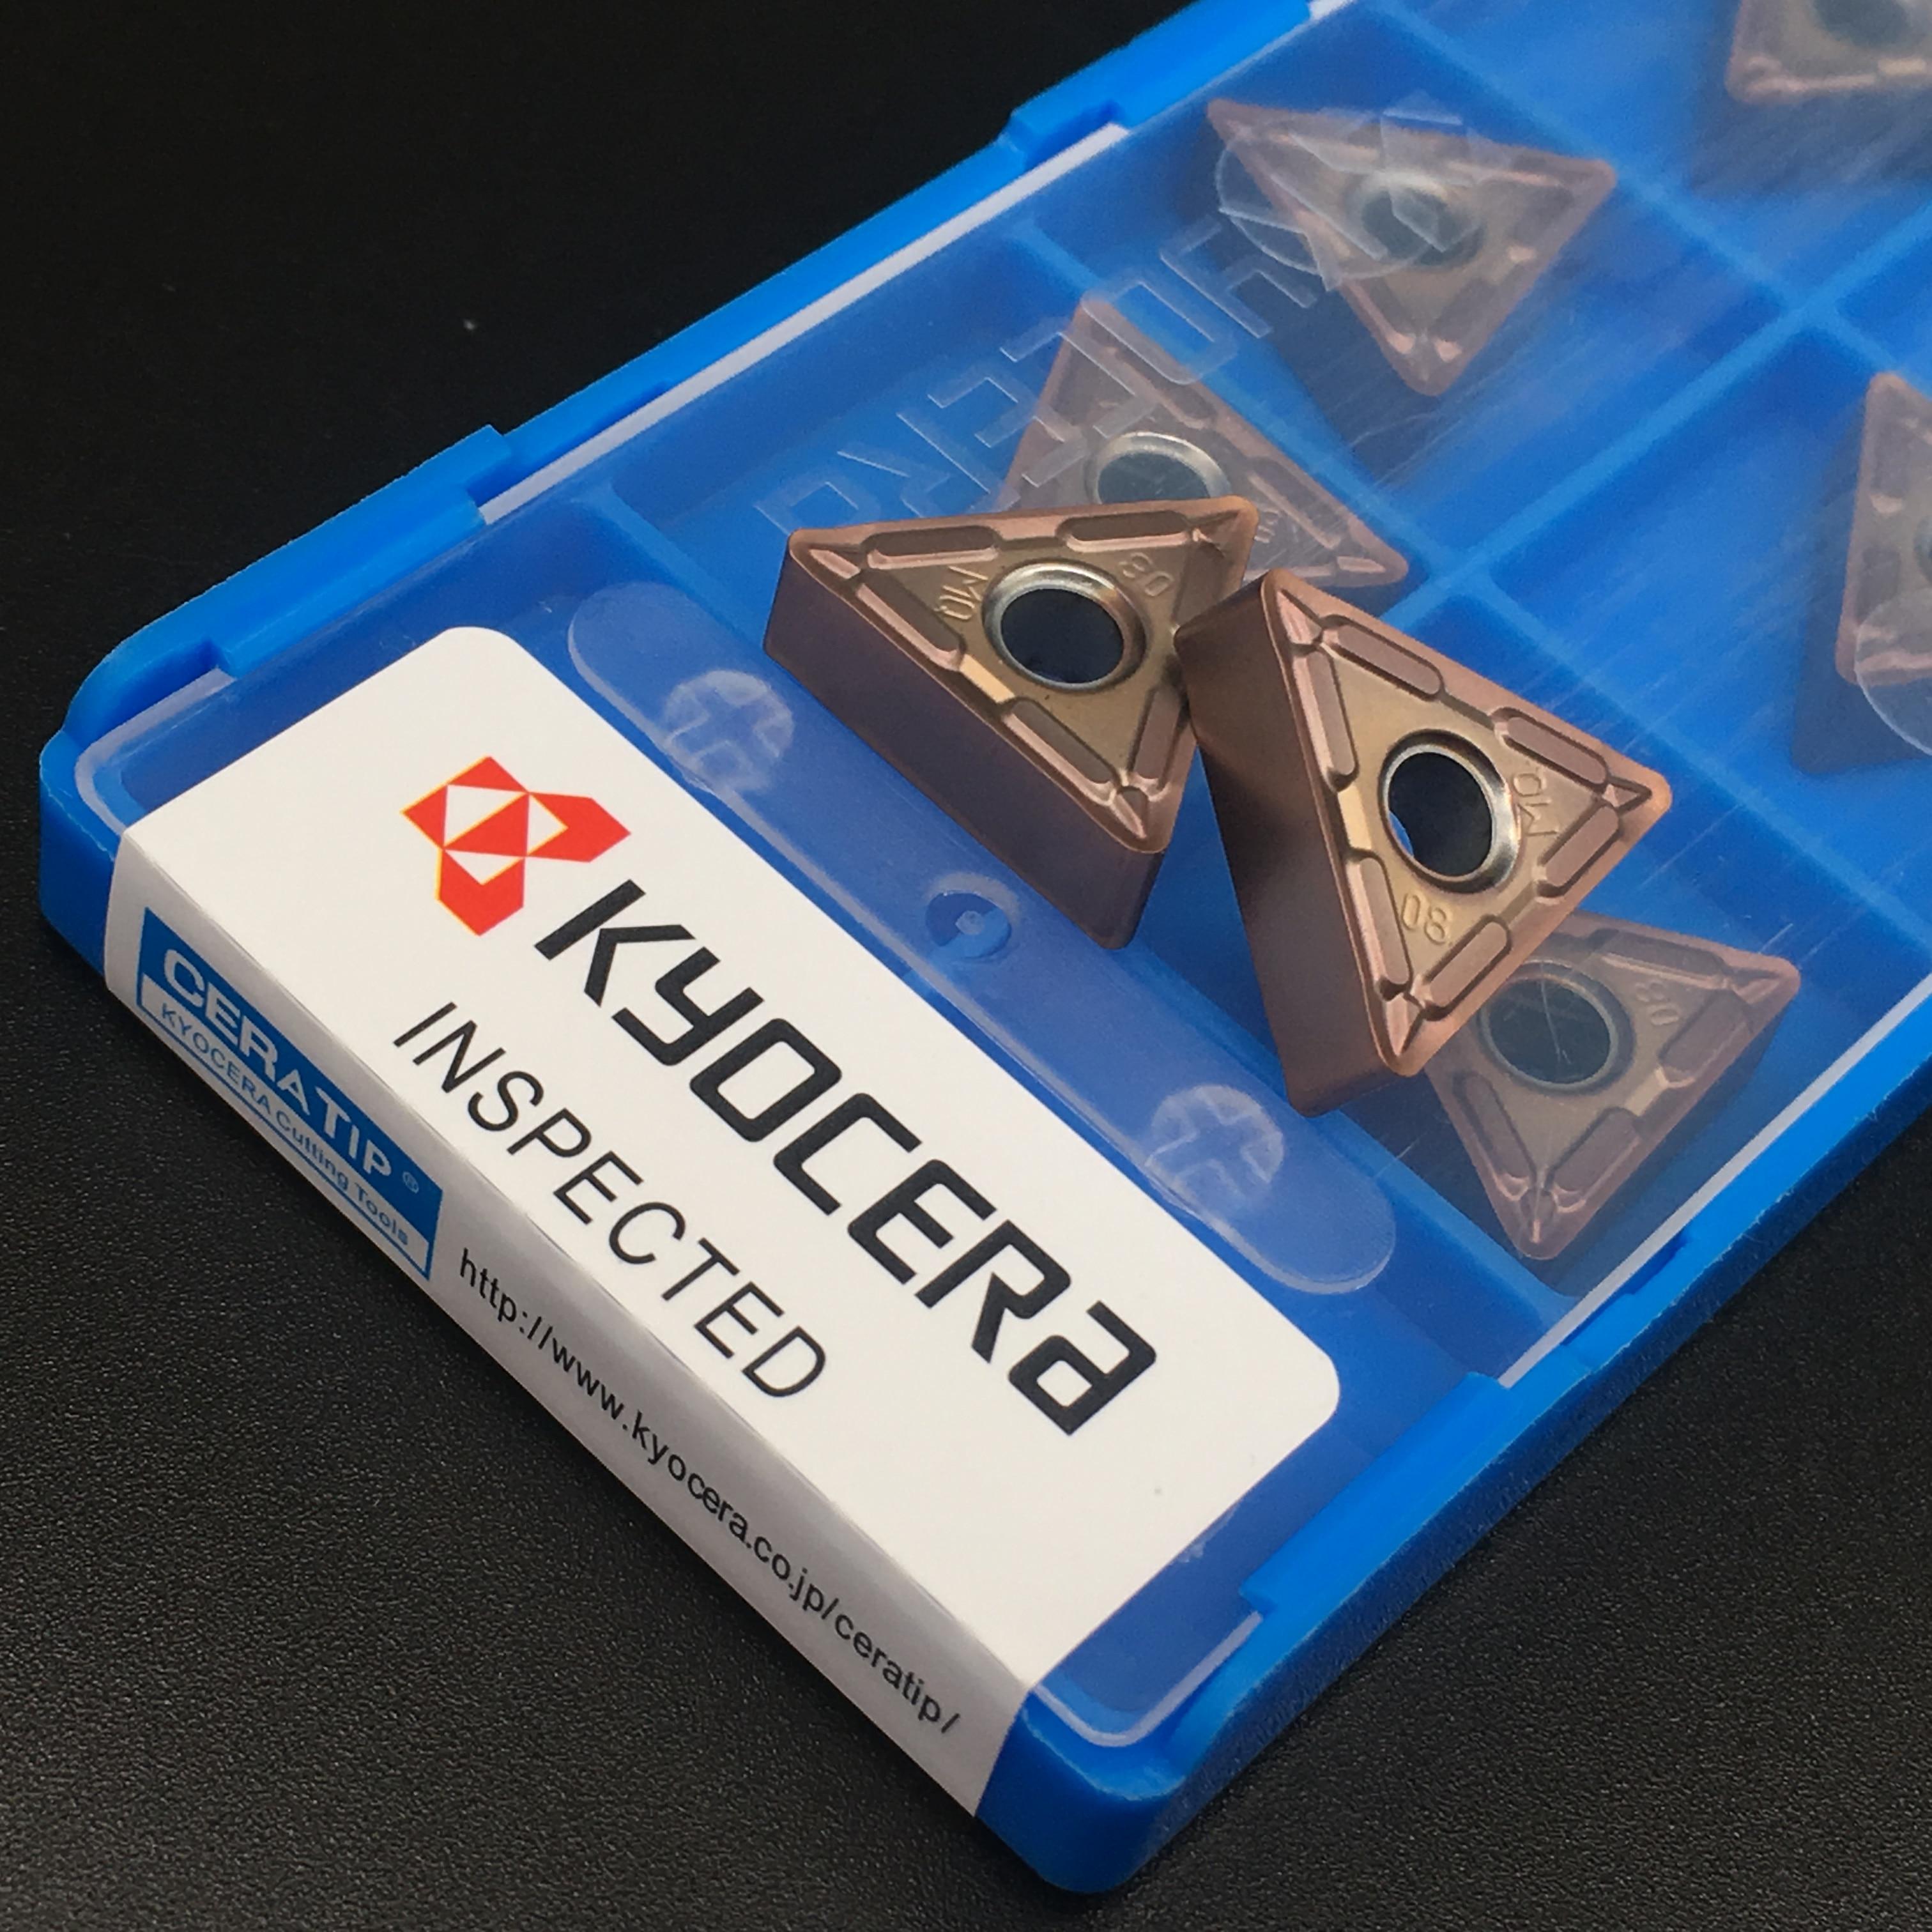 100% Original 10PCS TNMG160408 MQ PR1125 Turning Tool Carbide Inserts Lathe Tools For Stainless Steel High Quality Machining